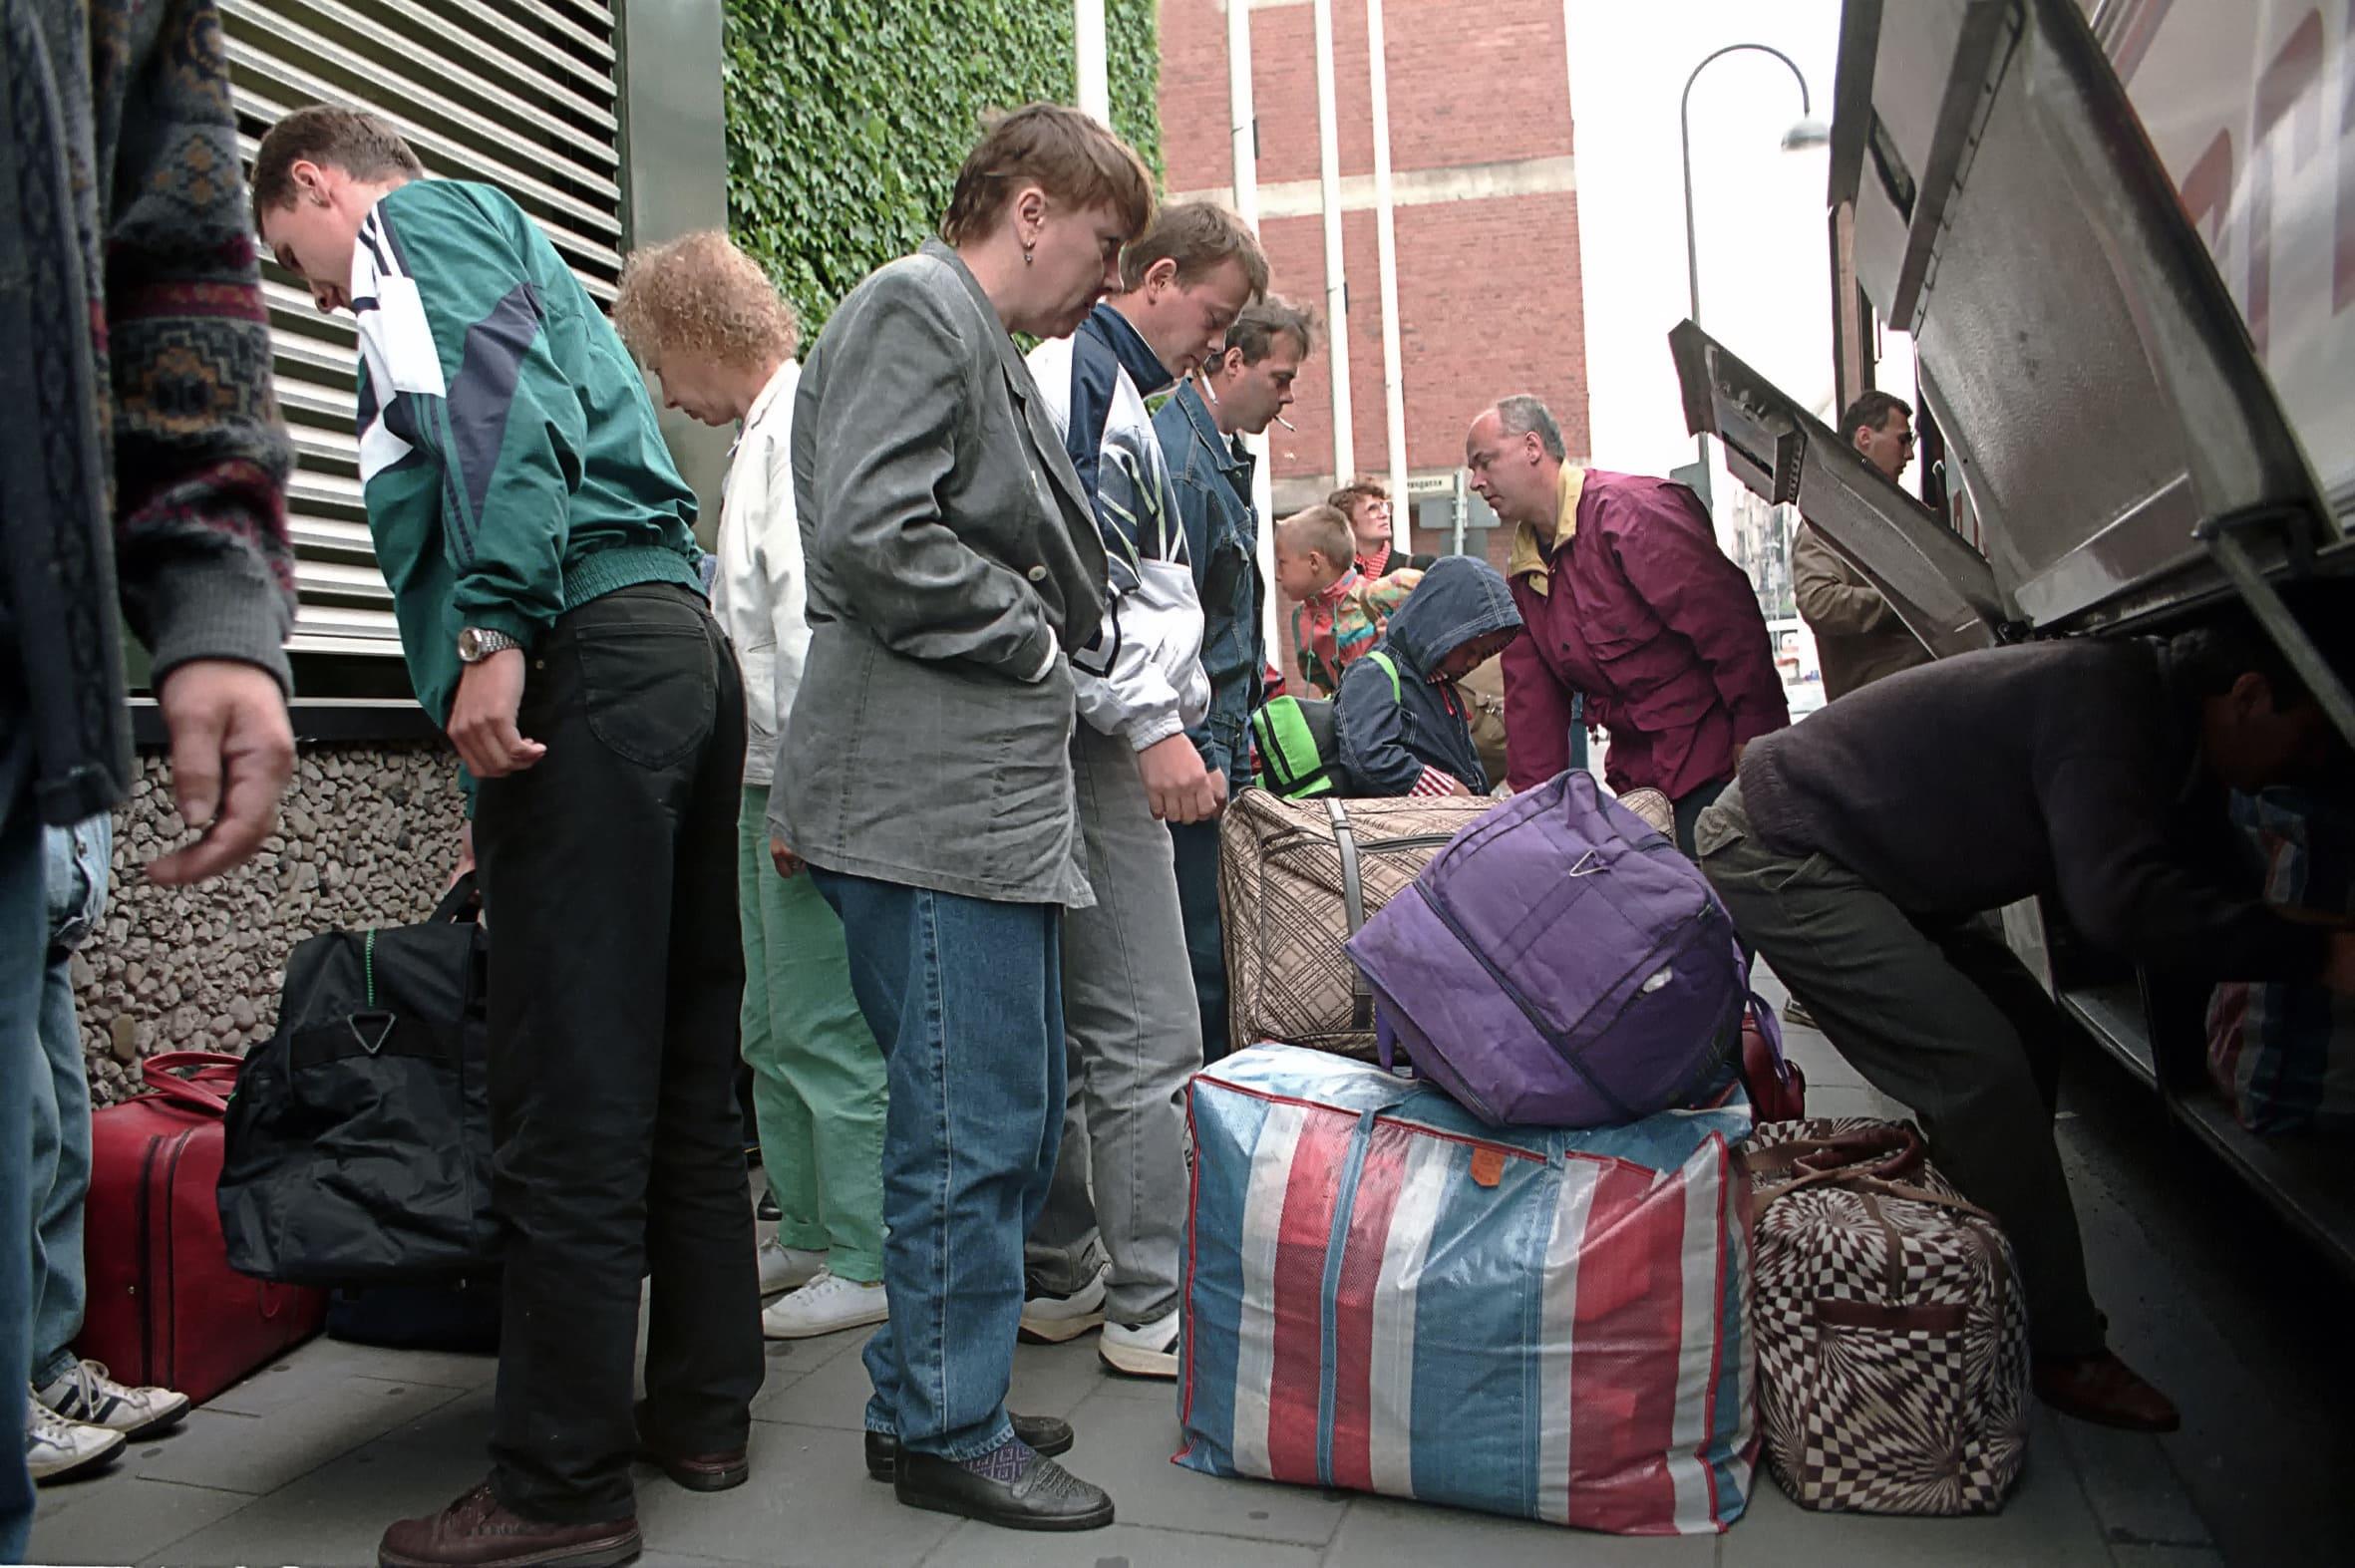 Jewish quota refugees